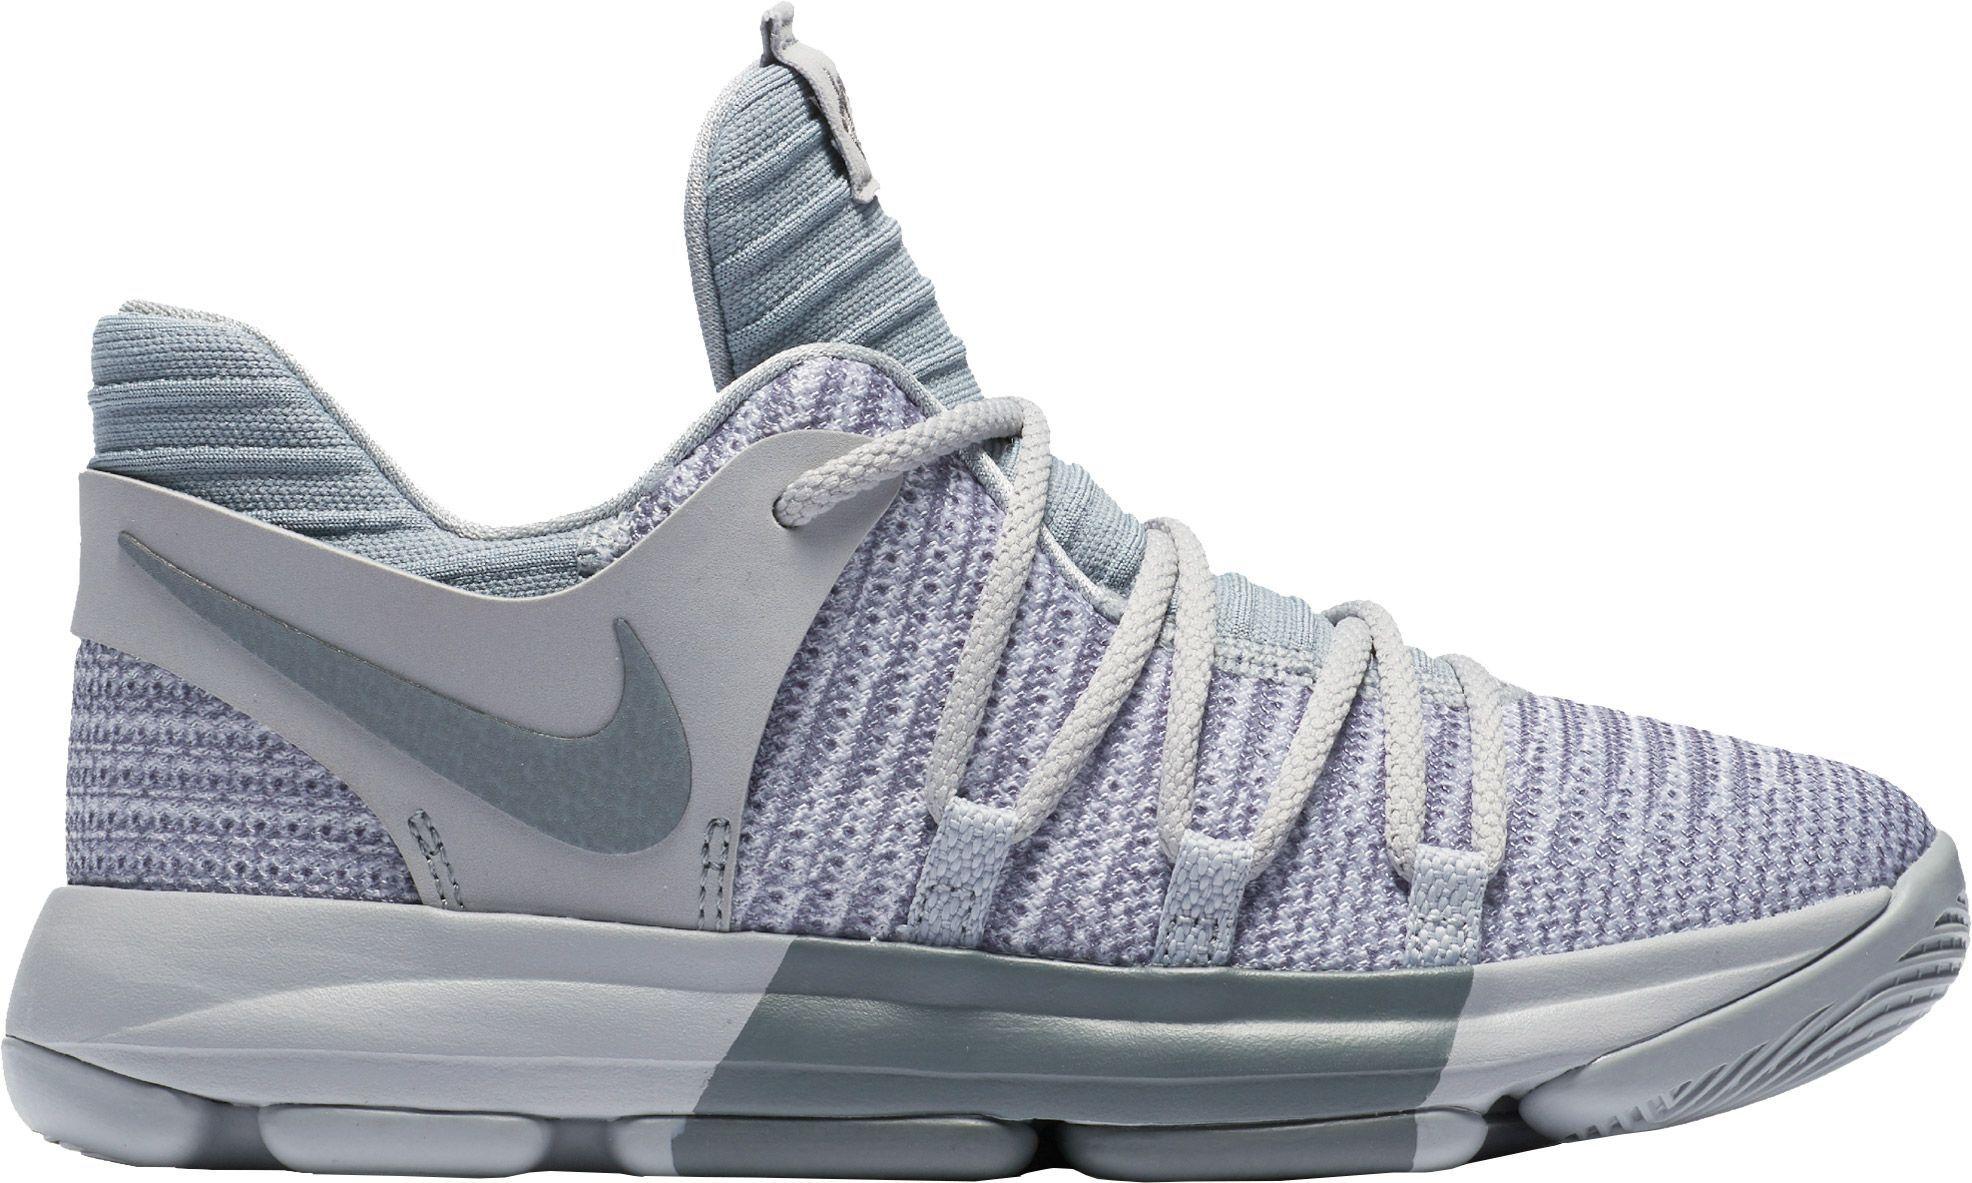 save off 813a3 c69b4 Nike Kids' Preschool Zoom KD 10 Basketball Shoes, Size: 11K ...